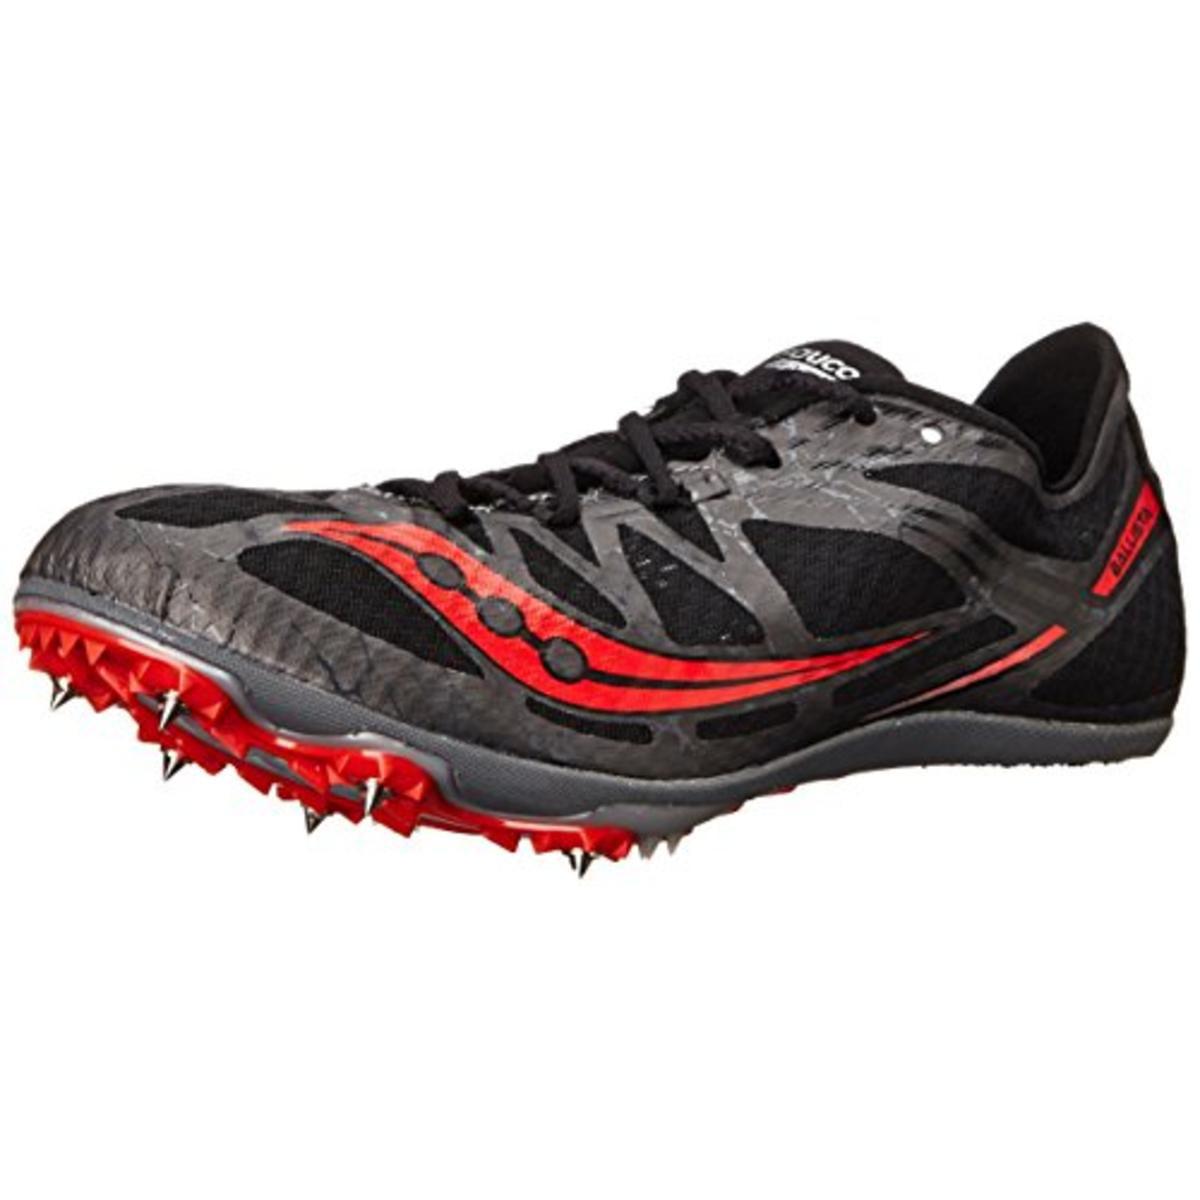 Saucony Mens Ballista Mesh Contrast Running, Cross Training Shoes by Saucony